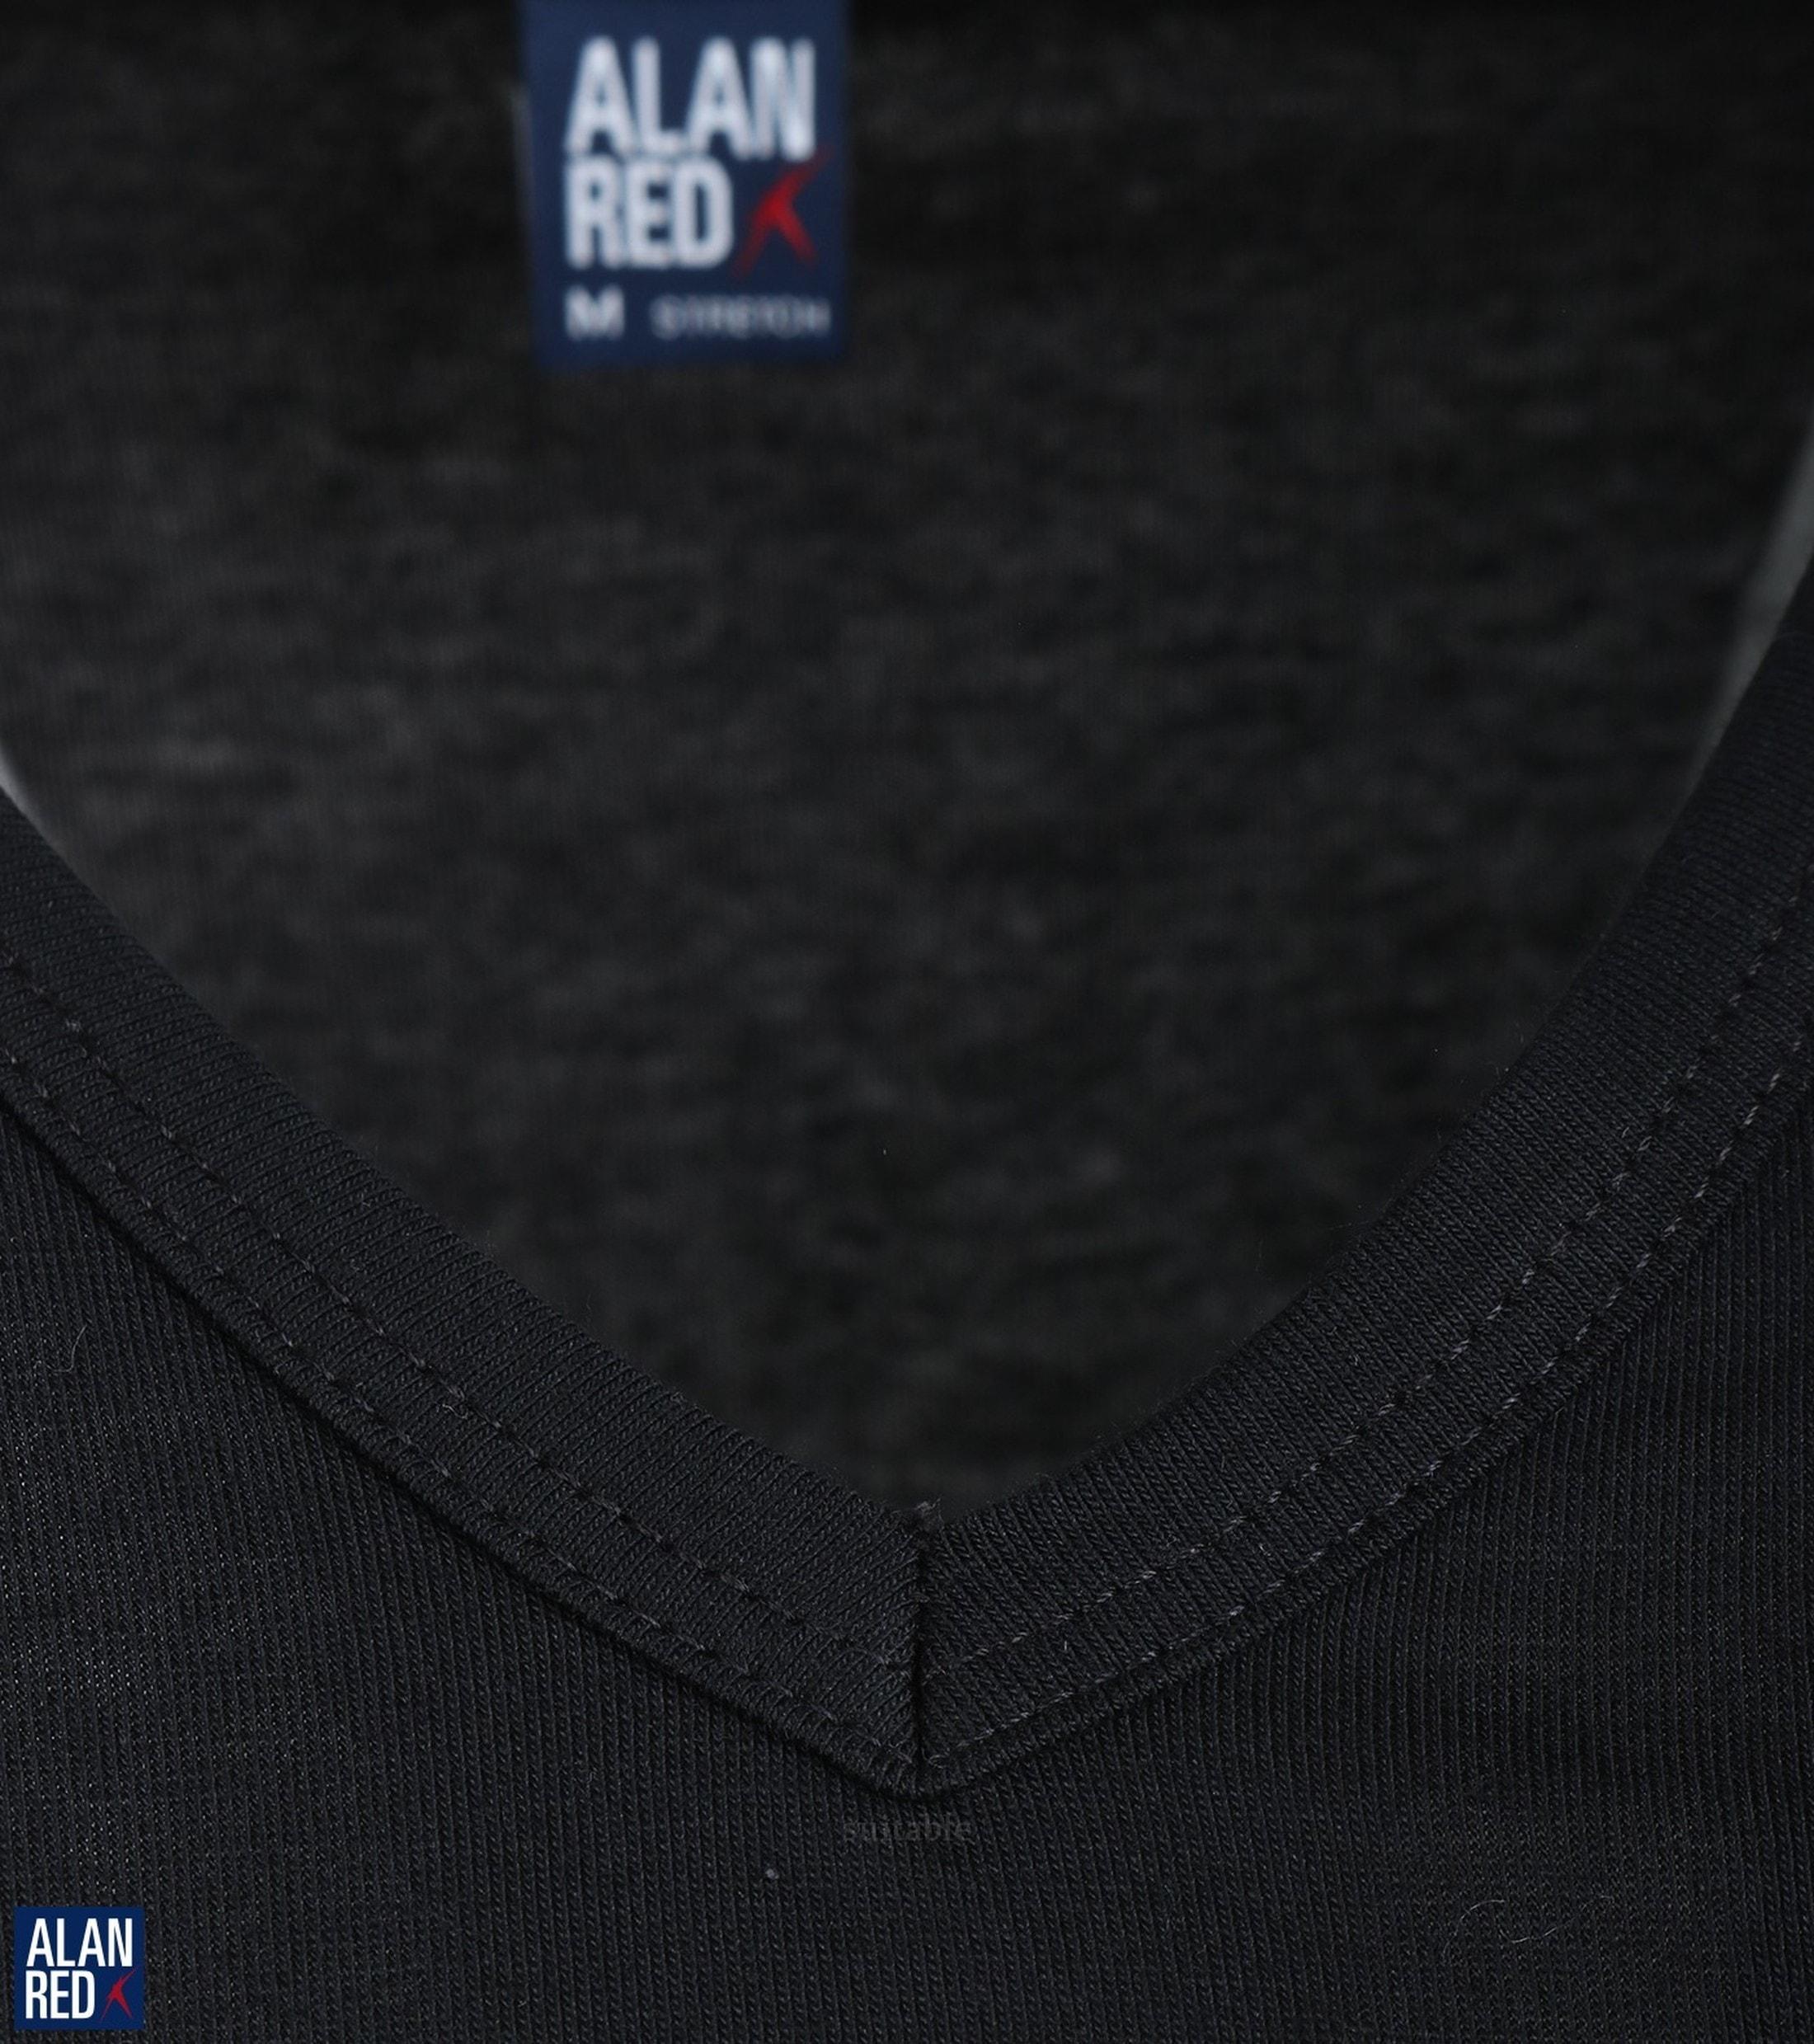 Alan Red Oklahoma Stretch T-Shirt V-Hals Schwarz (1 st.) foto 2